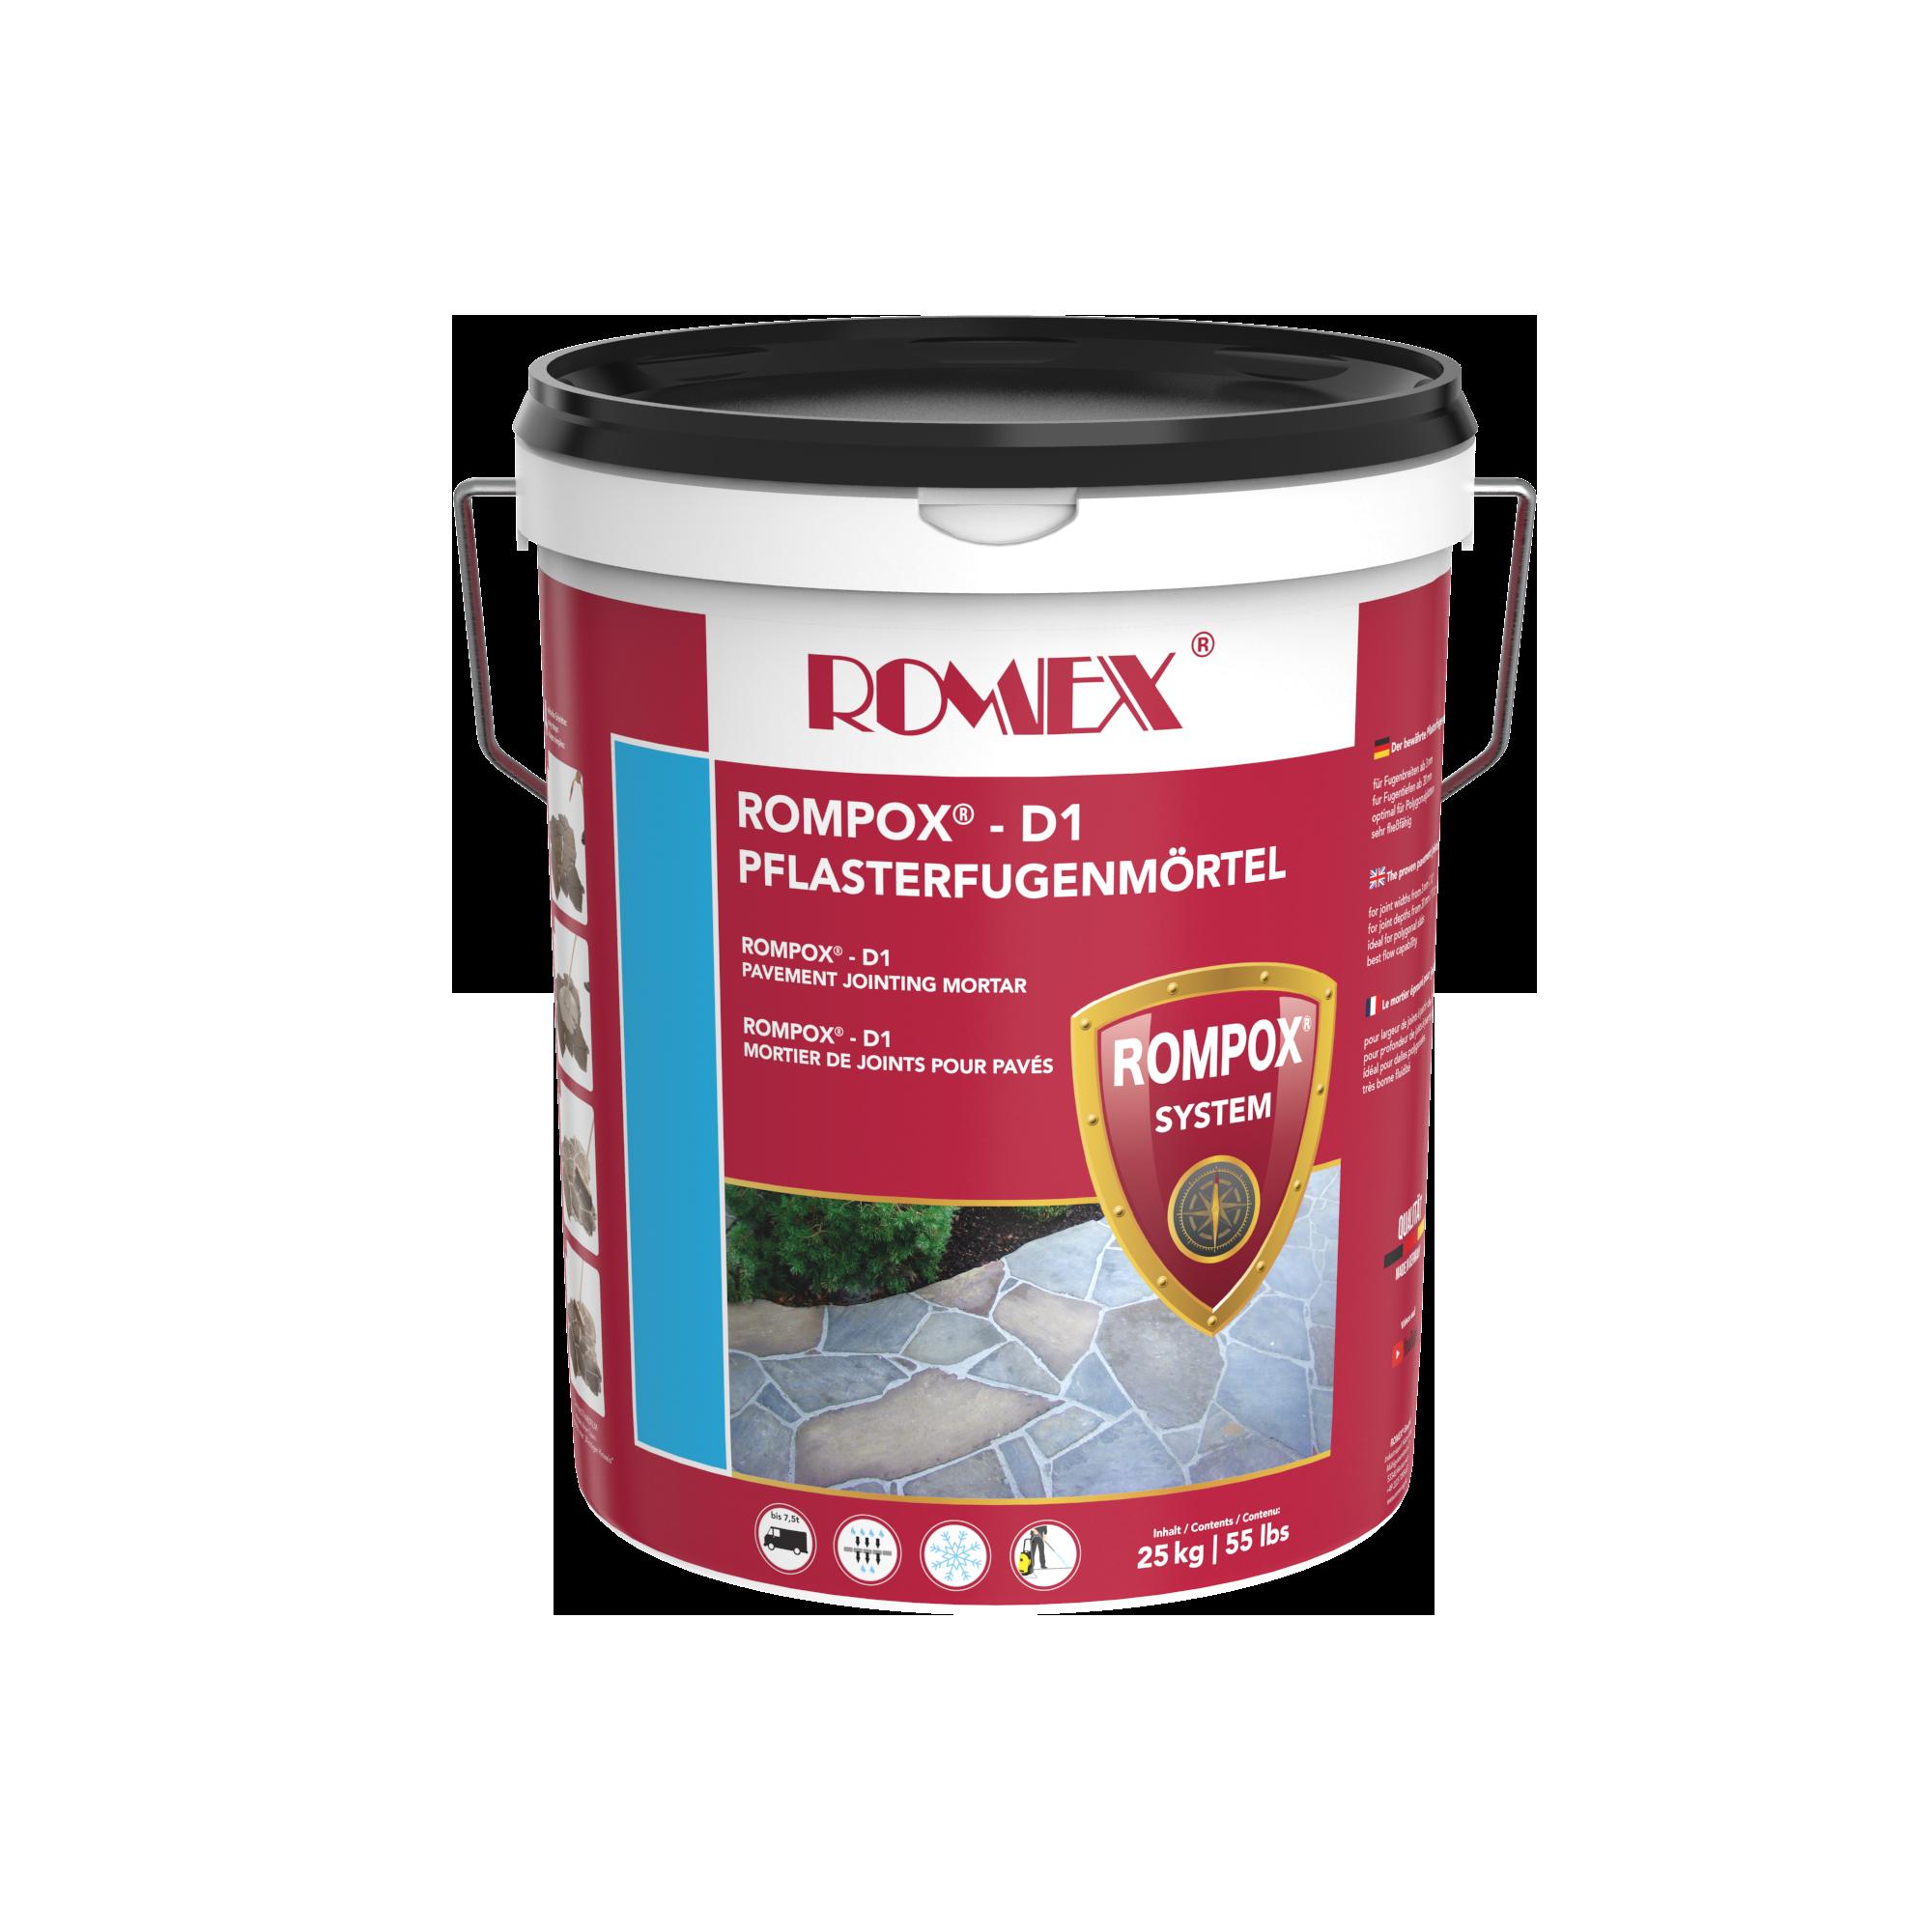 ROMPOX® -D1 basalt